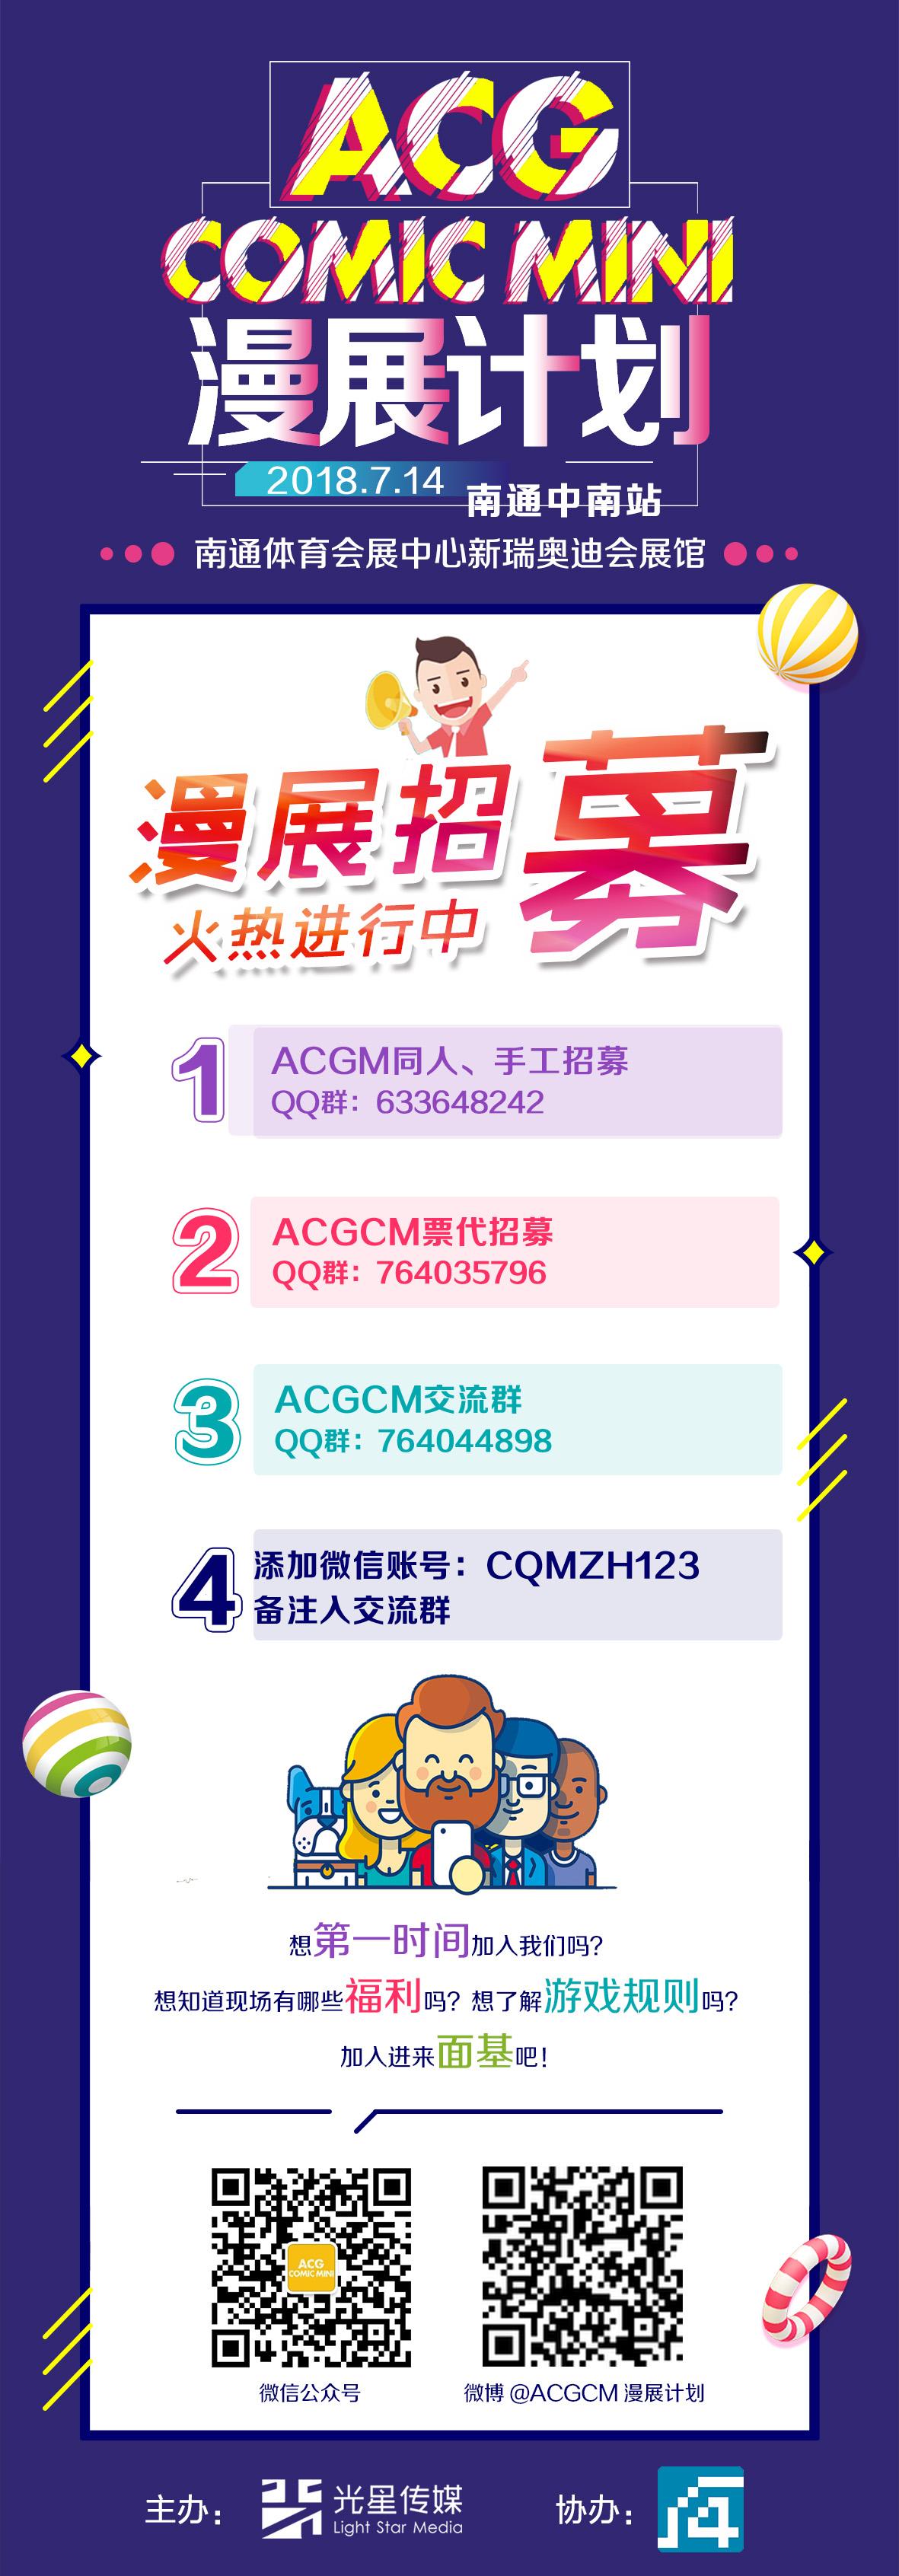 ACG comic mini 动漫竞技嘉年华-ANICOGA